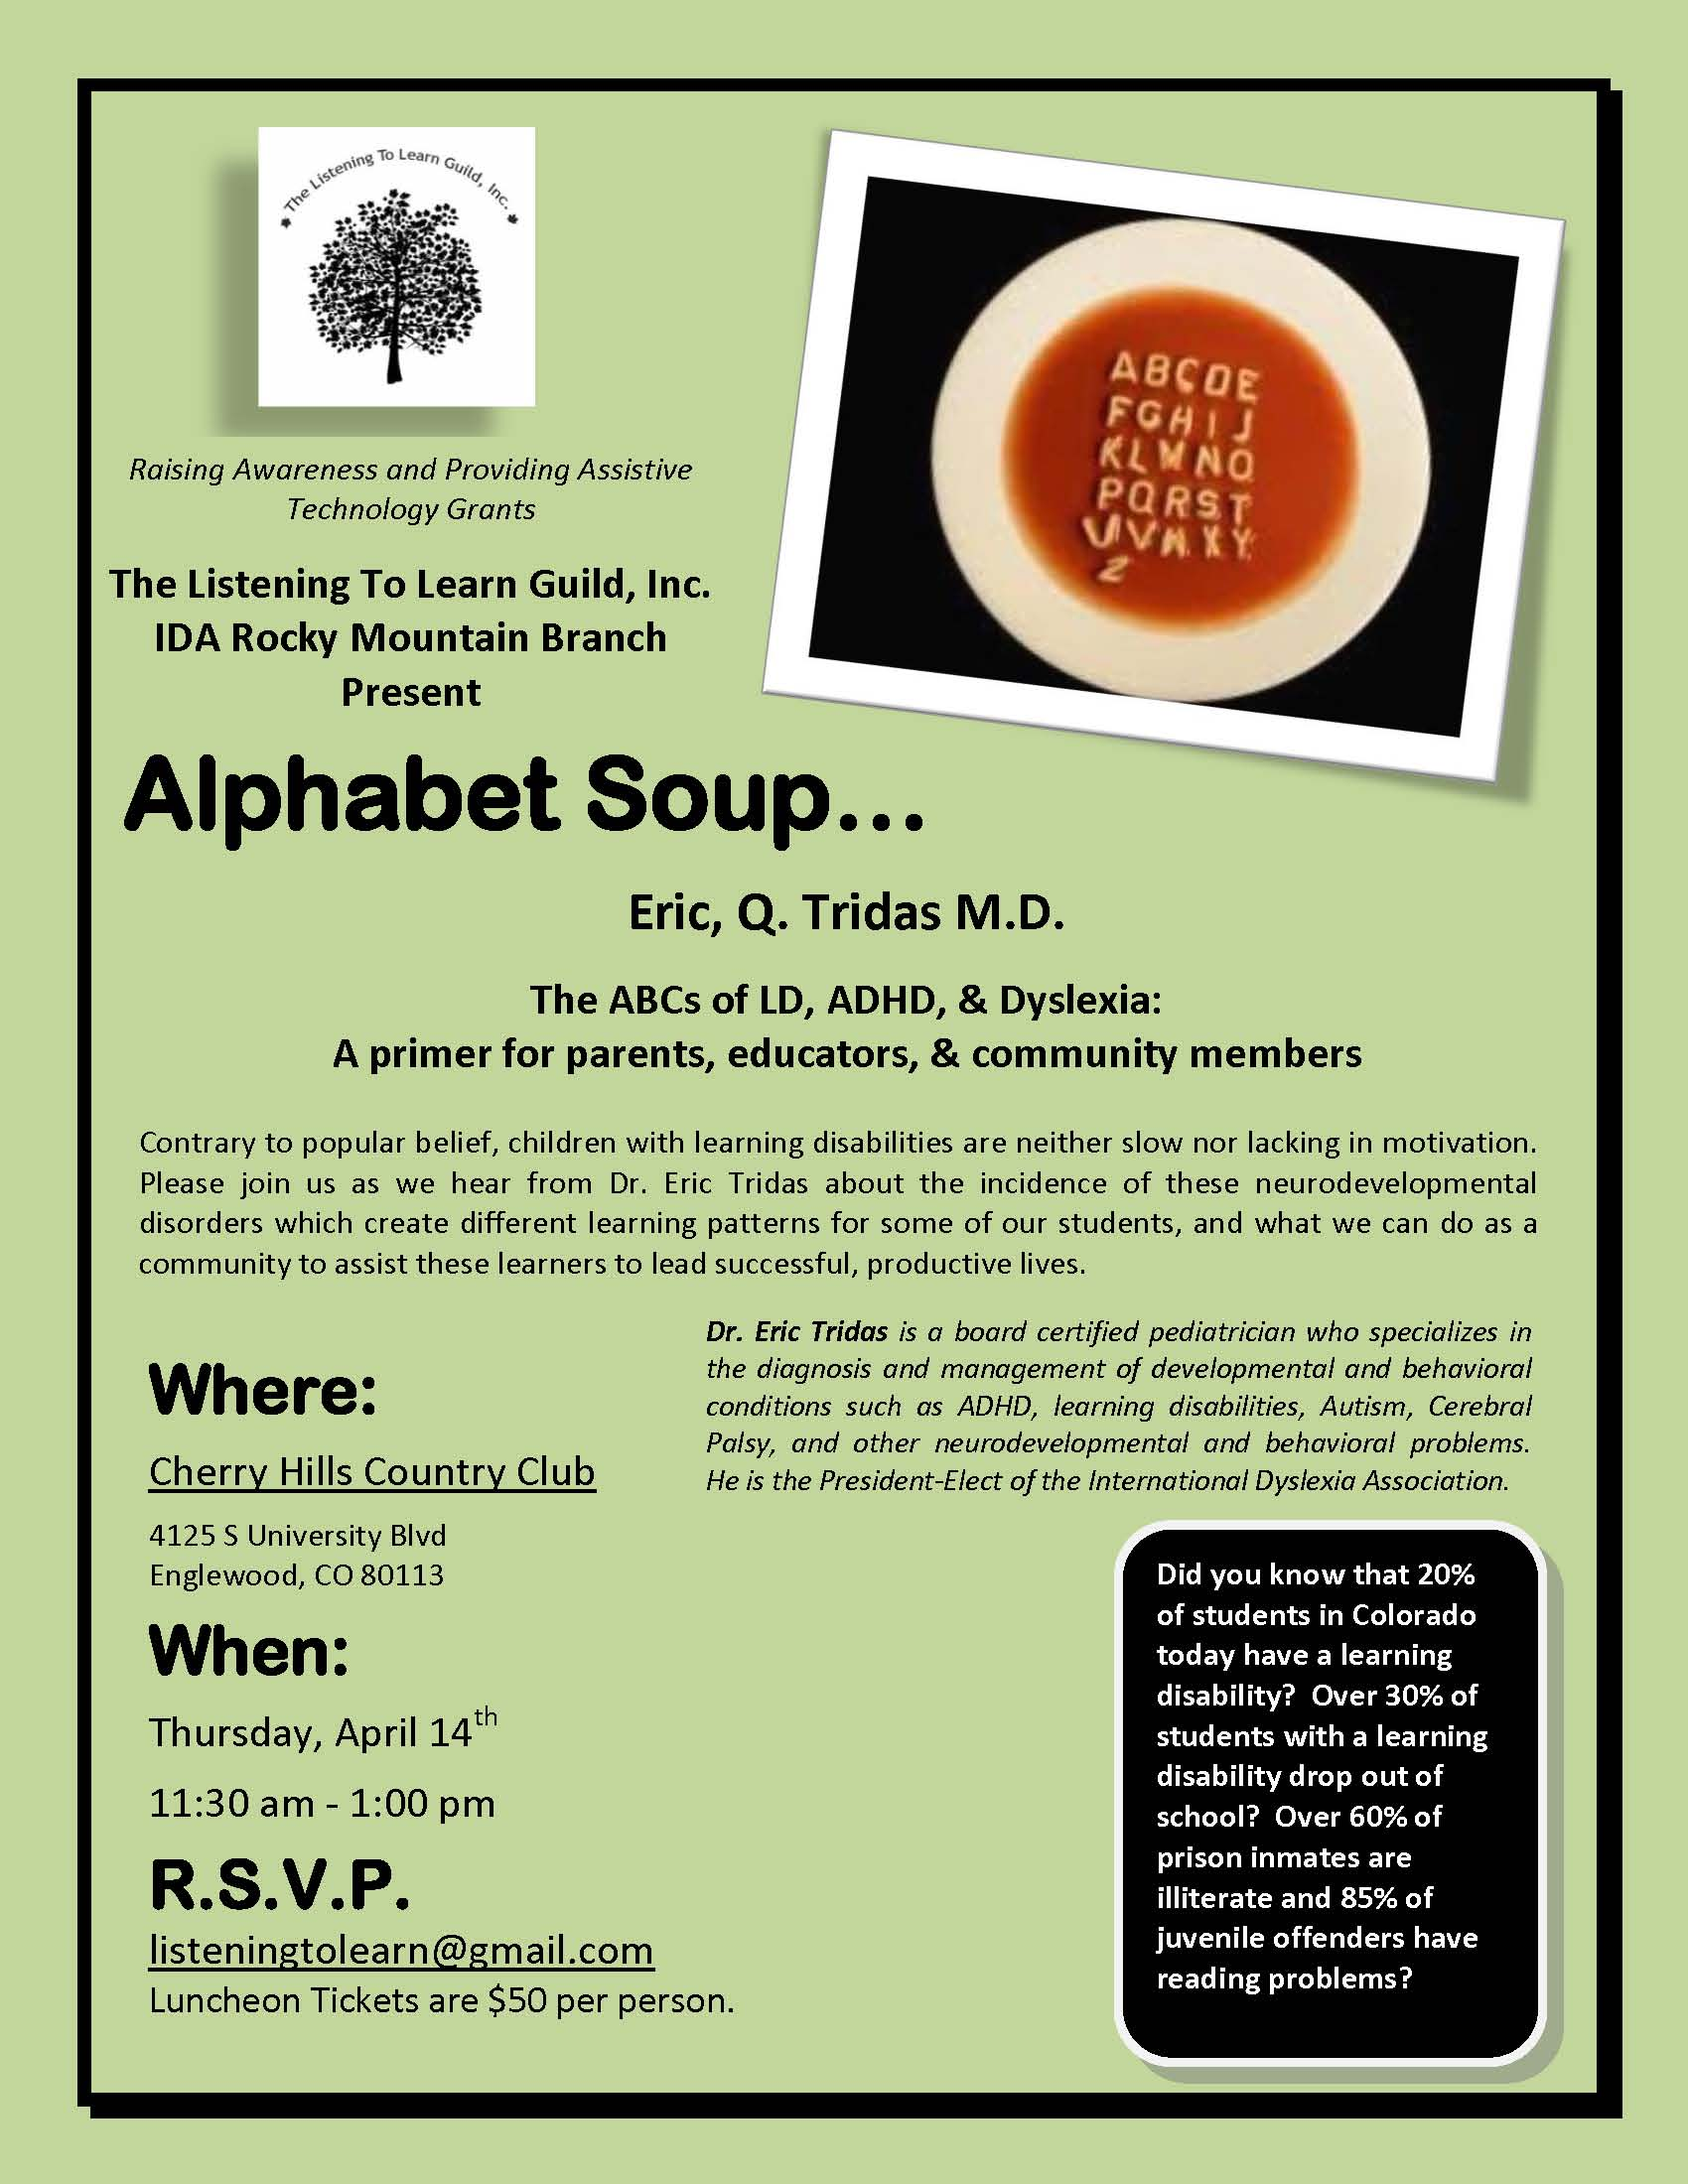 Dyslexia Awareness Campaign Upcoming >> Alphabet Soup A Dyslexia Primer Denver Dyslexia Awareness Blog